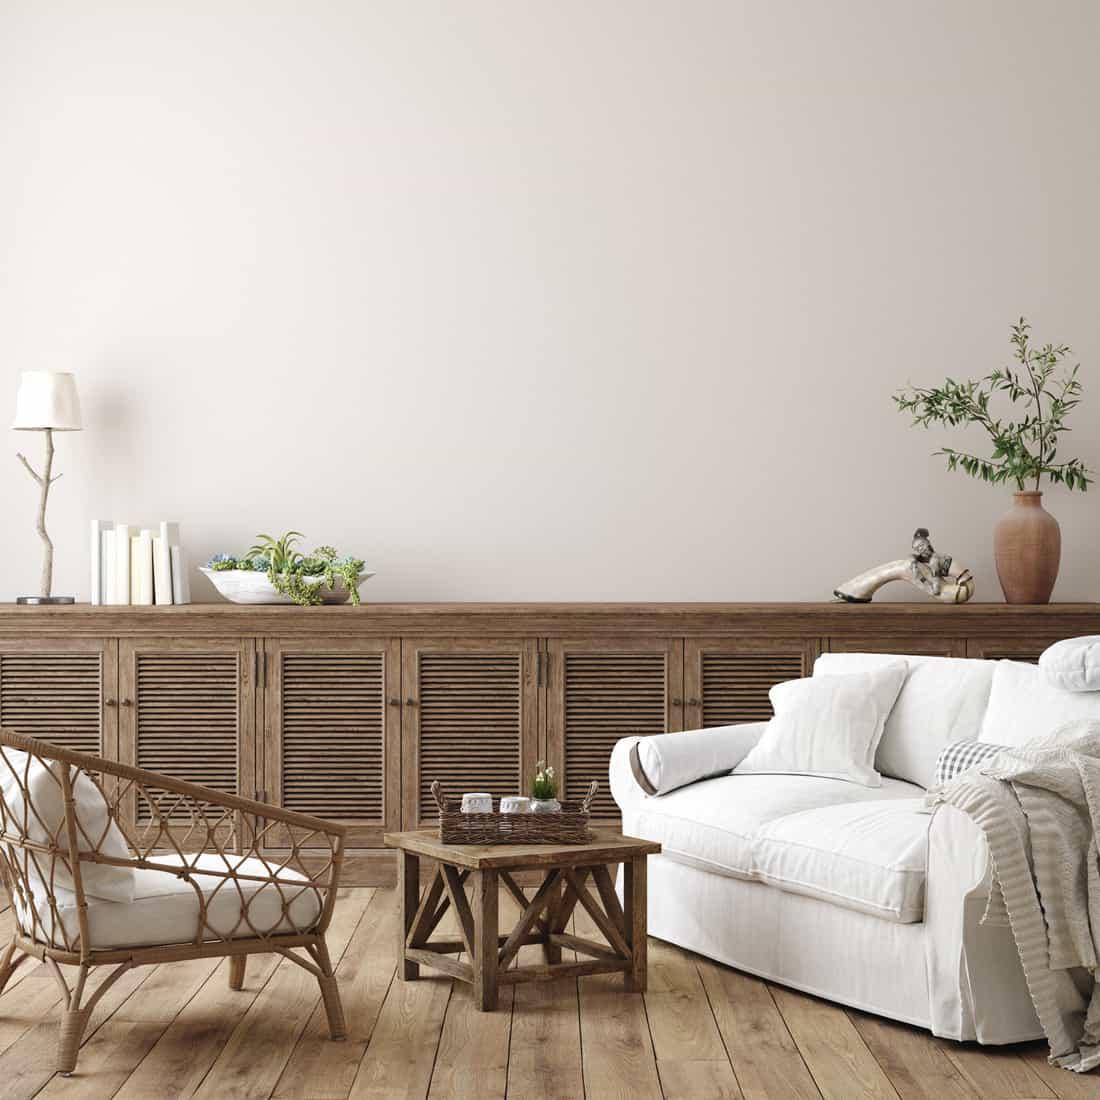 Scandinavian farmhouse living room interior, wall mockup